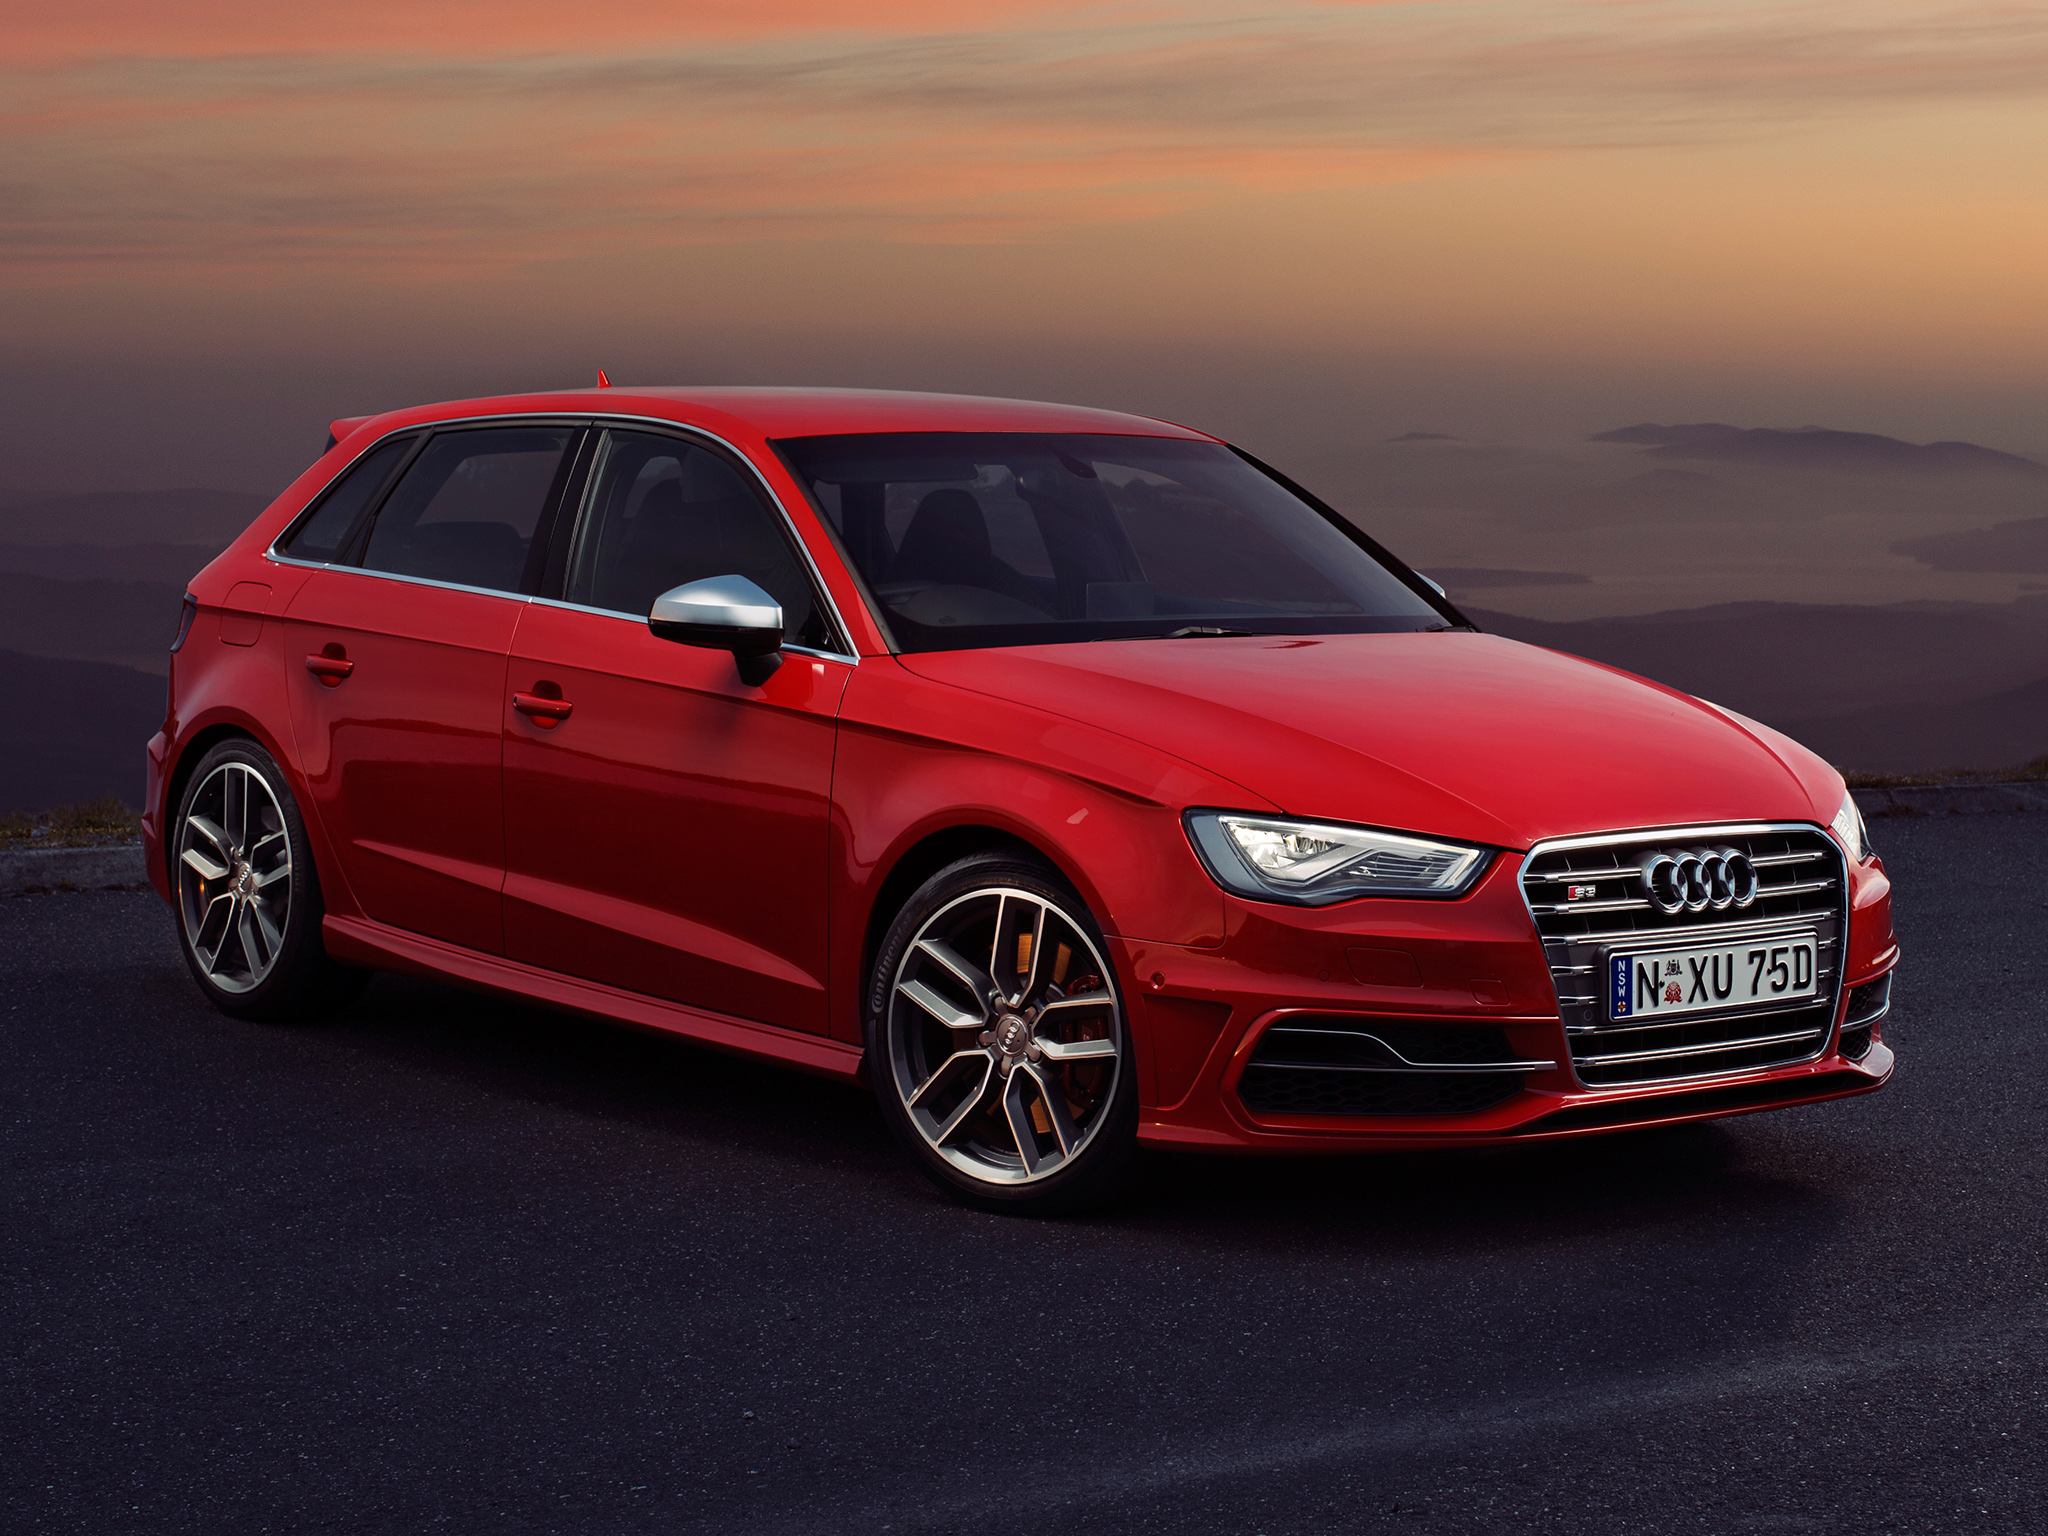 Kelebihan Audi S3 2014 Top Model Tahun Ini